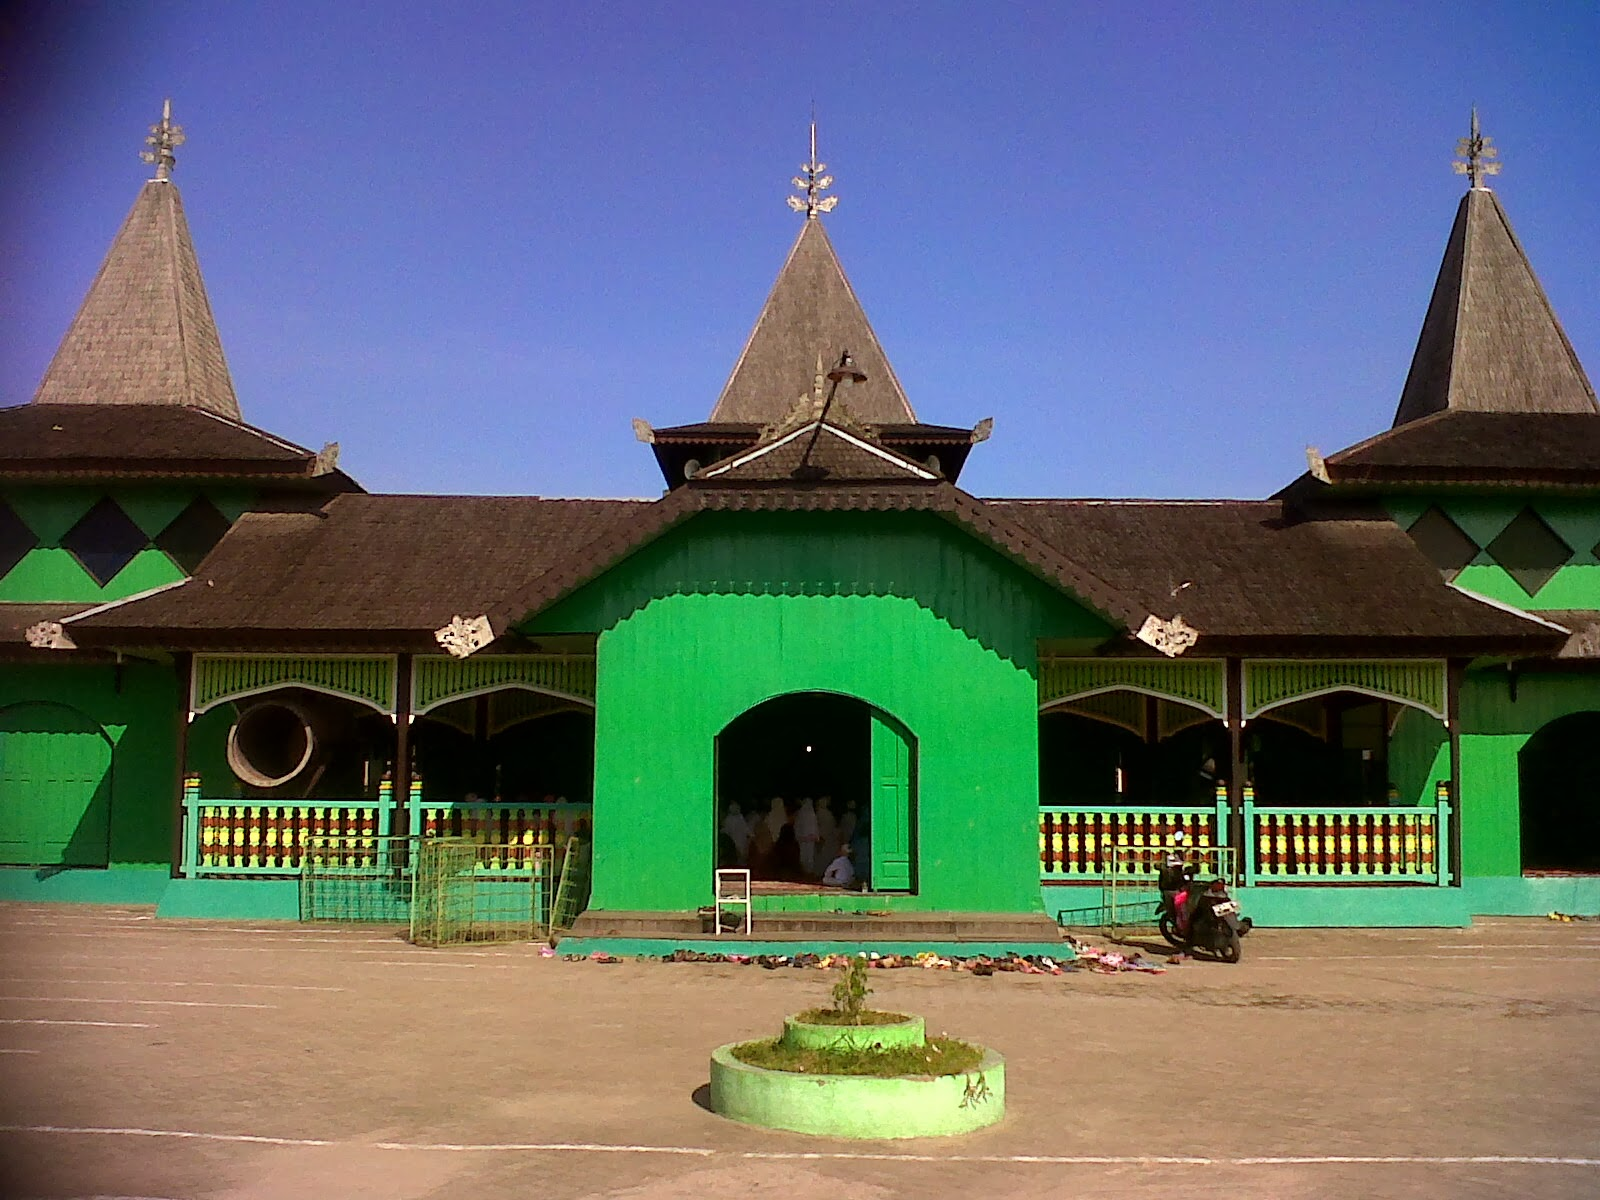 Wildan Sari Masjid Sultan Suriansyah Kab Banjarmasin